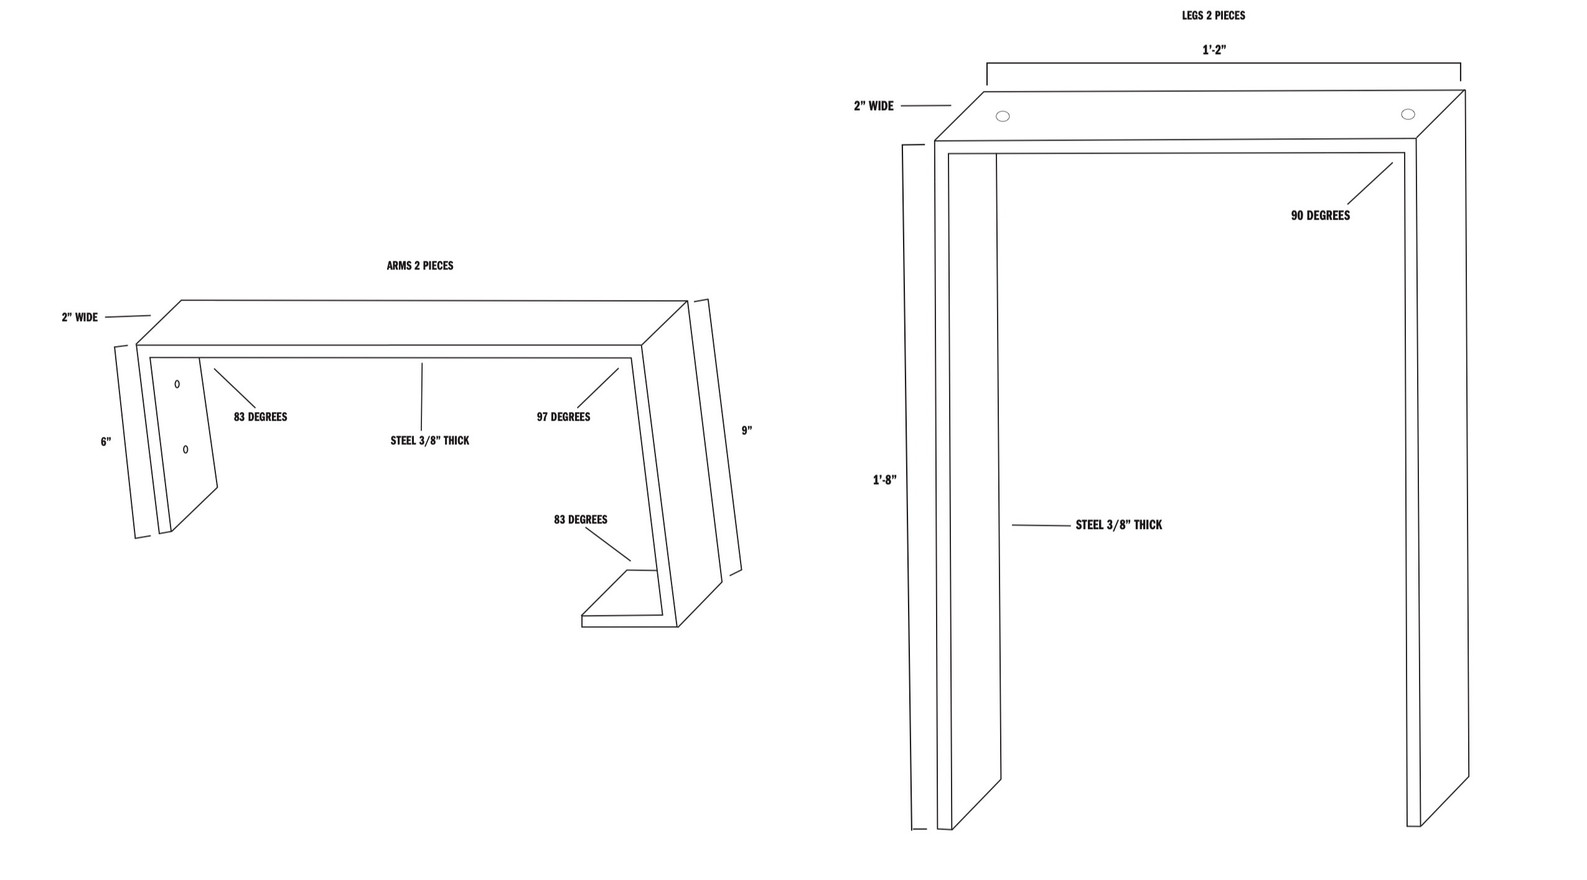 steel detail sketches